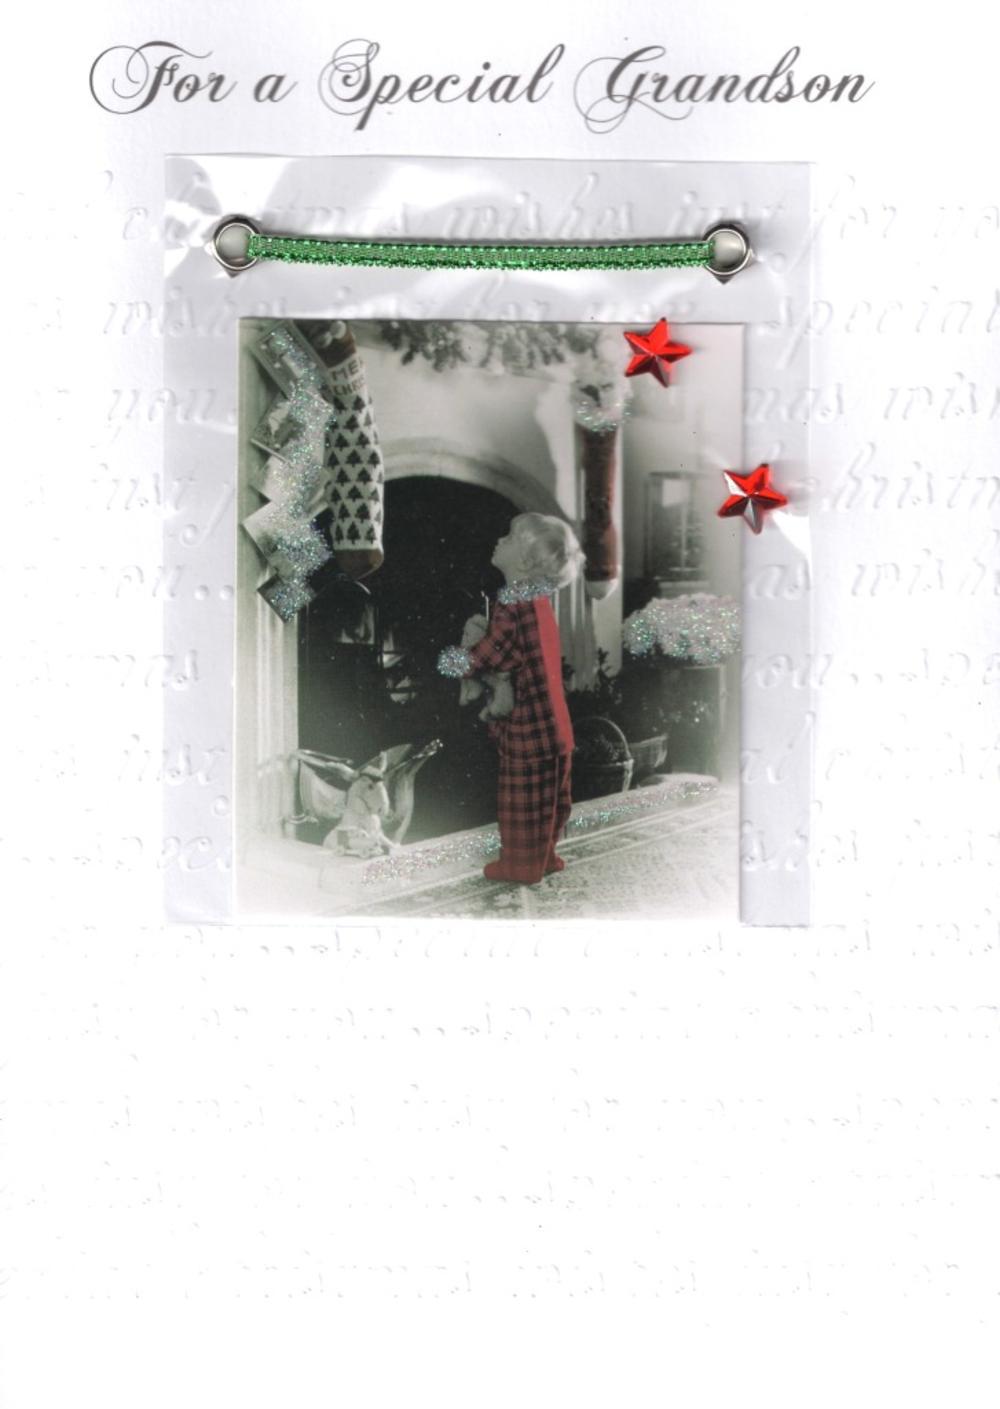 Grandson Luxury Retro 3D Christmas Card